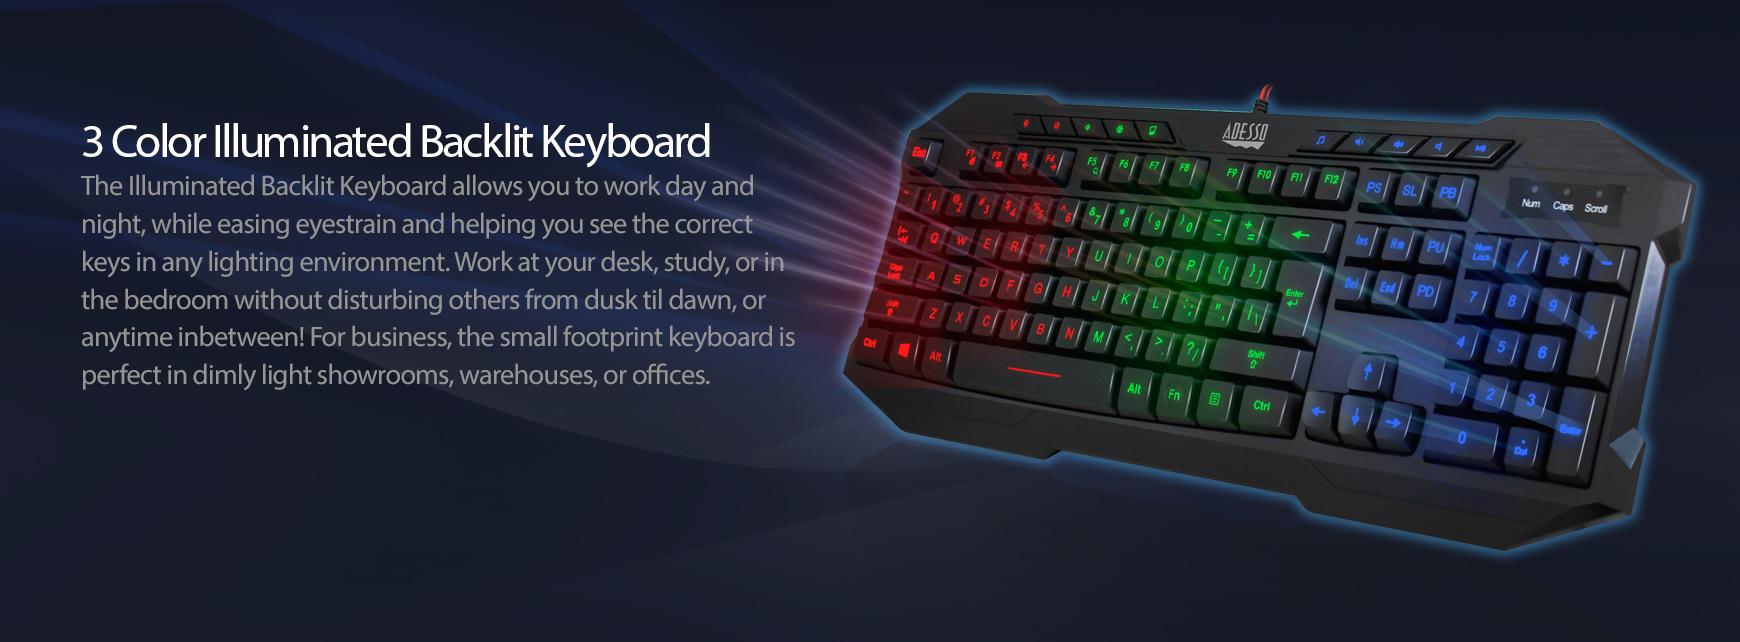 Model Number: AKB-135EB Categories: Gaming Keyboards, Gaming Solutions,  Illuminated, Keyboards